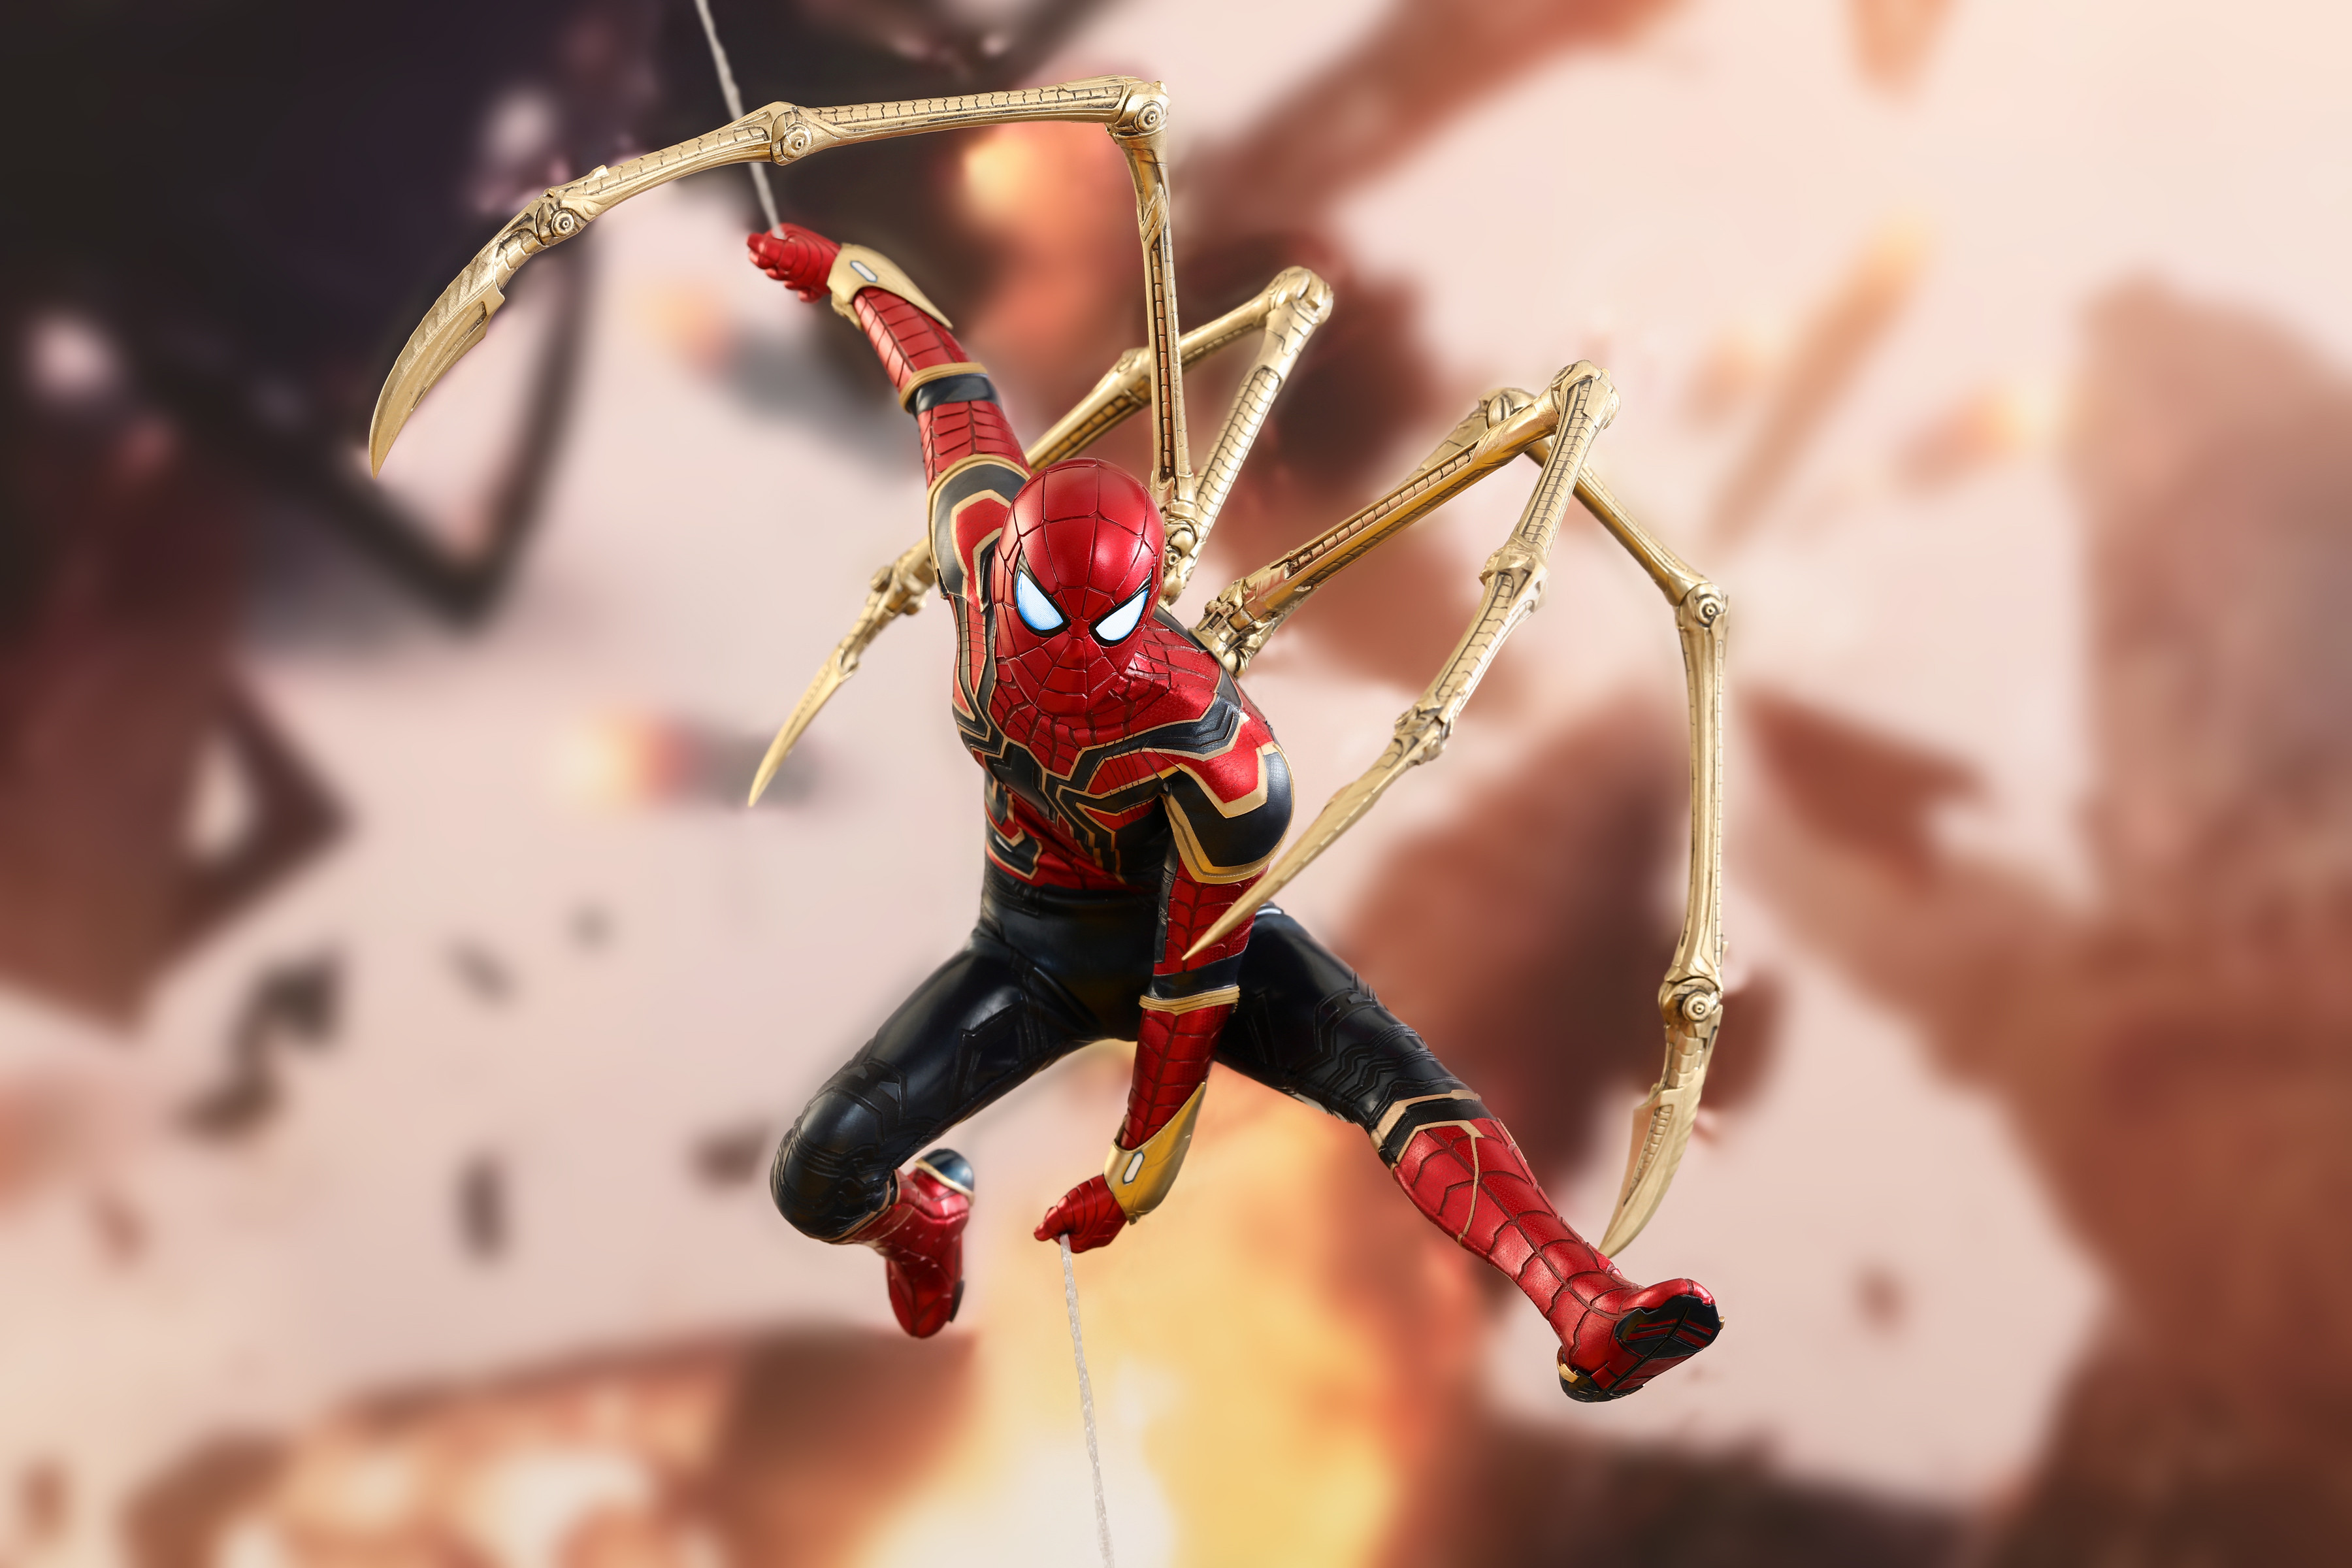 1680x1050 Iron Spiderman Suit 4k 1680x1050 Resolution Hd 4k